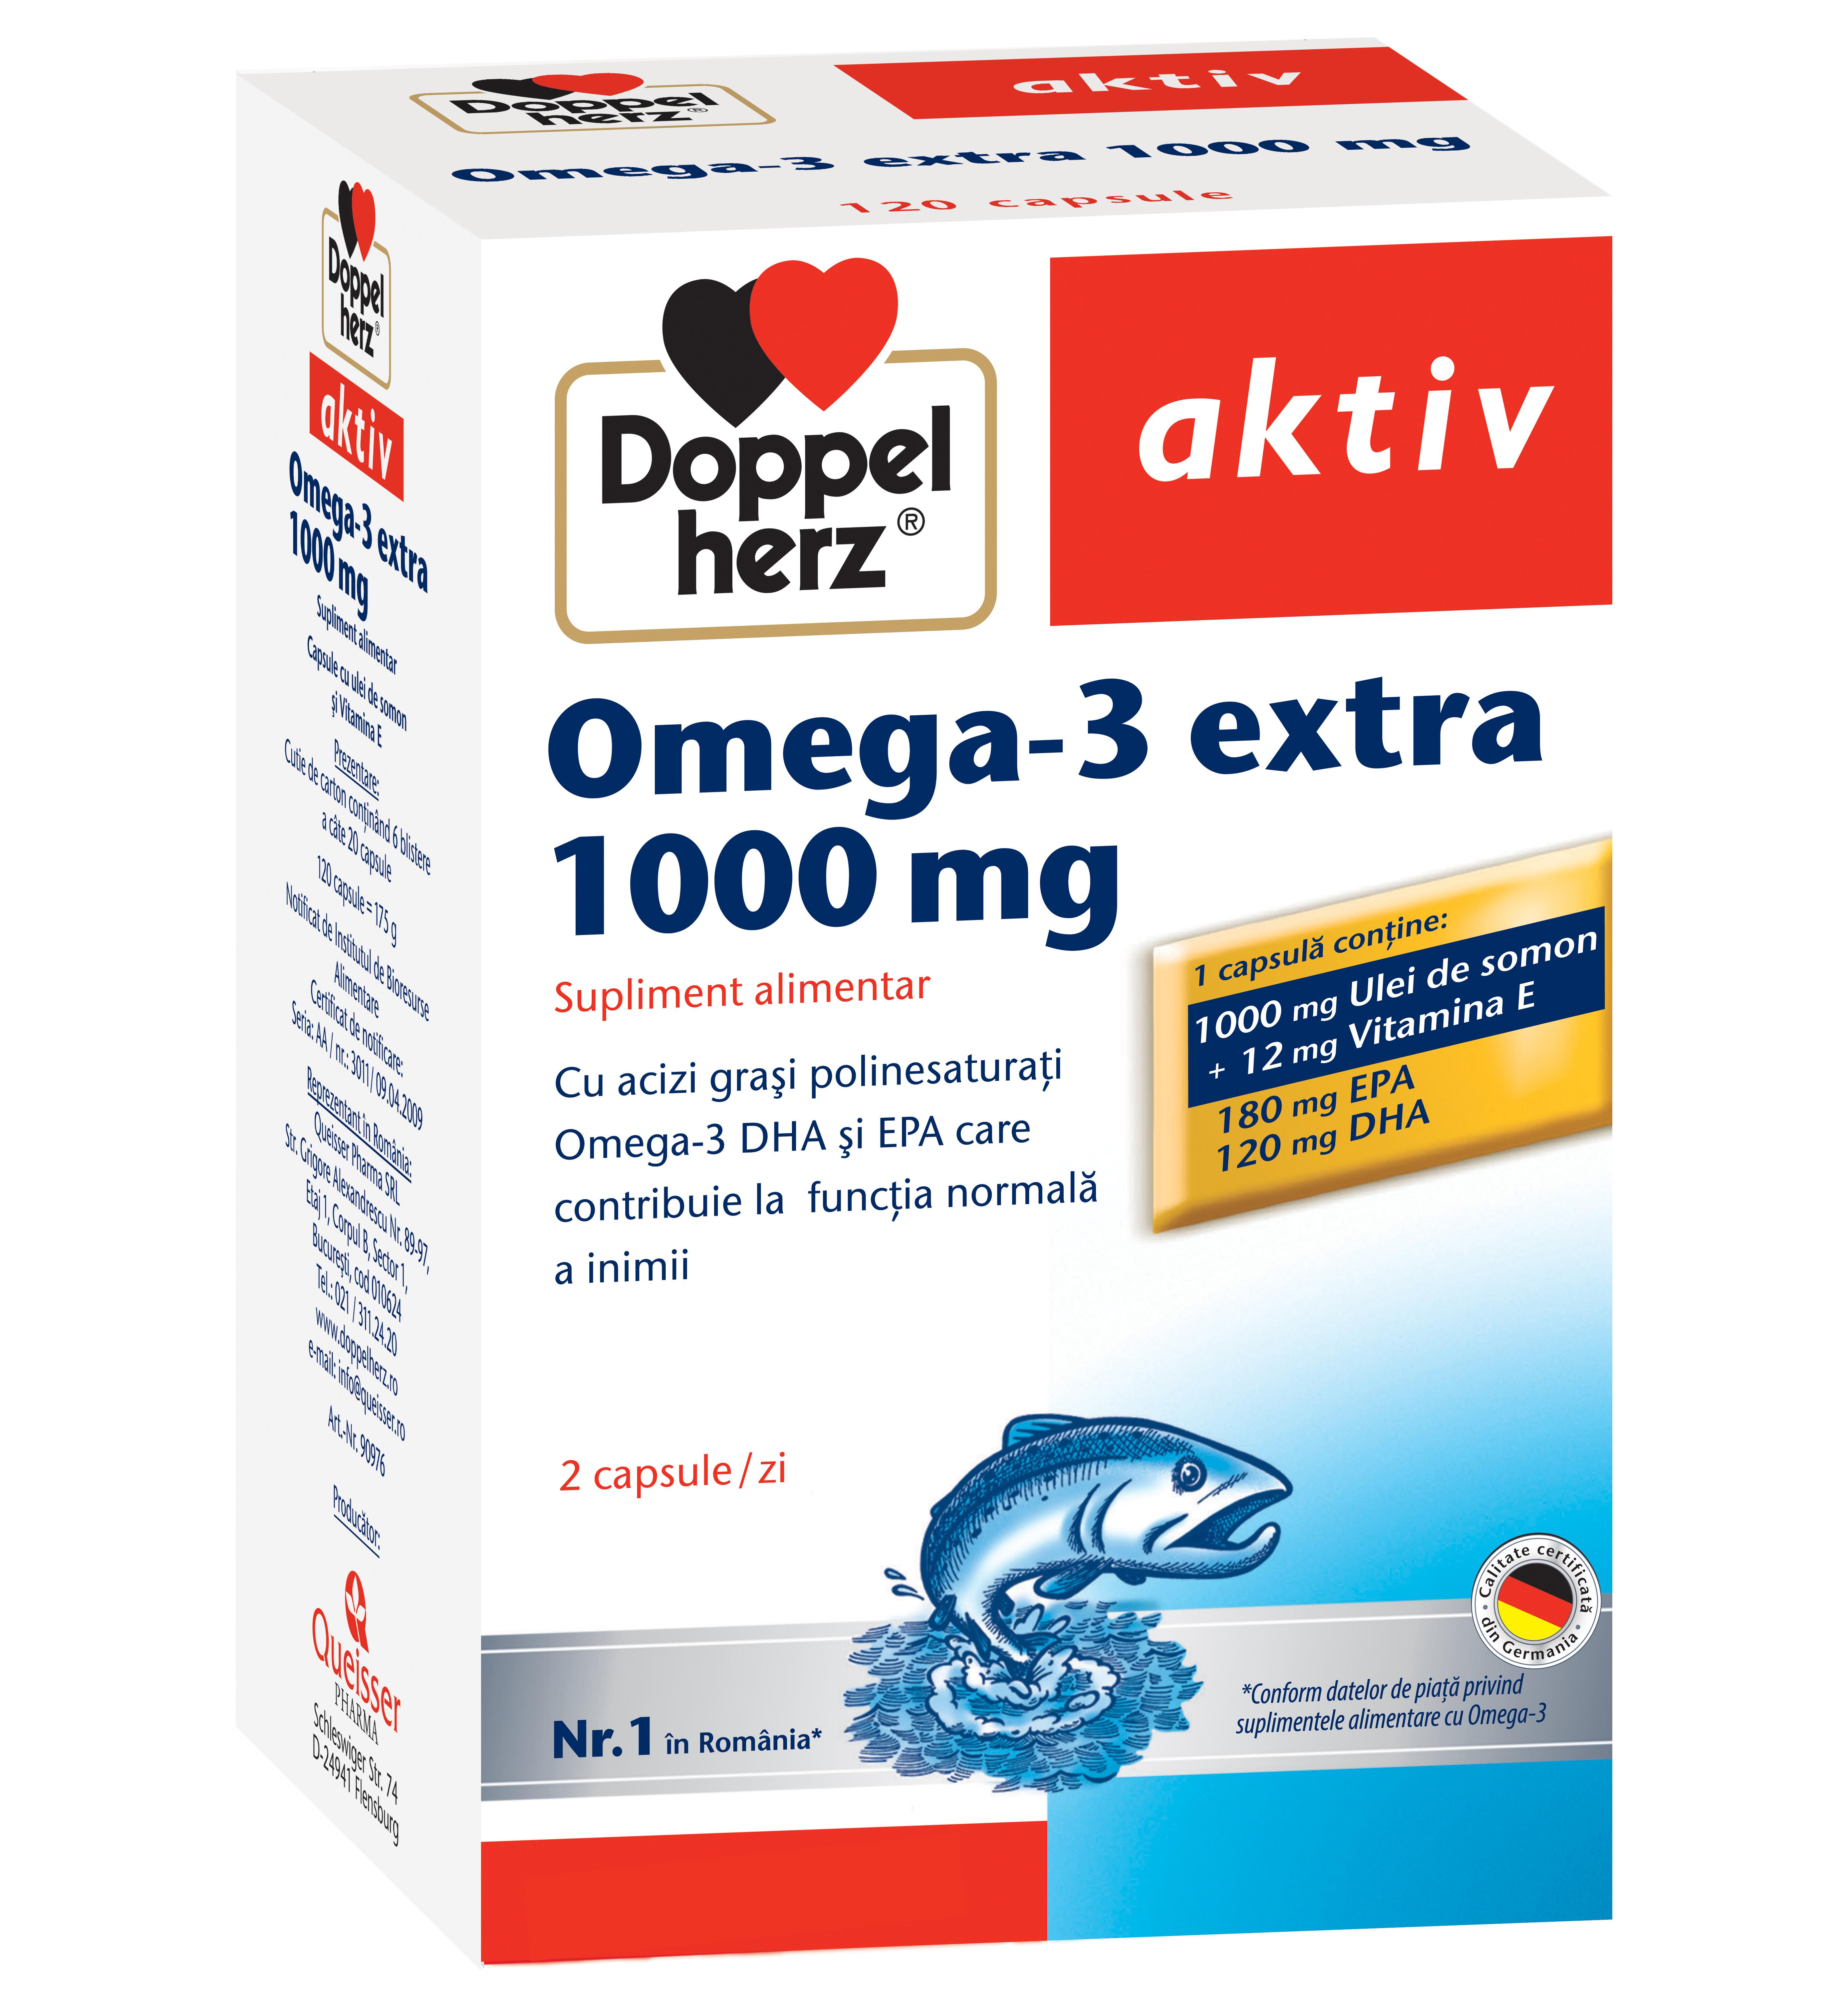 Omega-3 extra 1000 mg, 120 capsule, Doppelherz